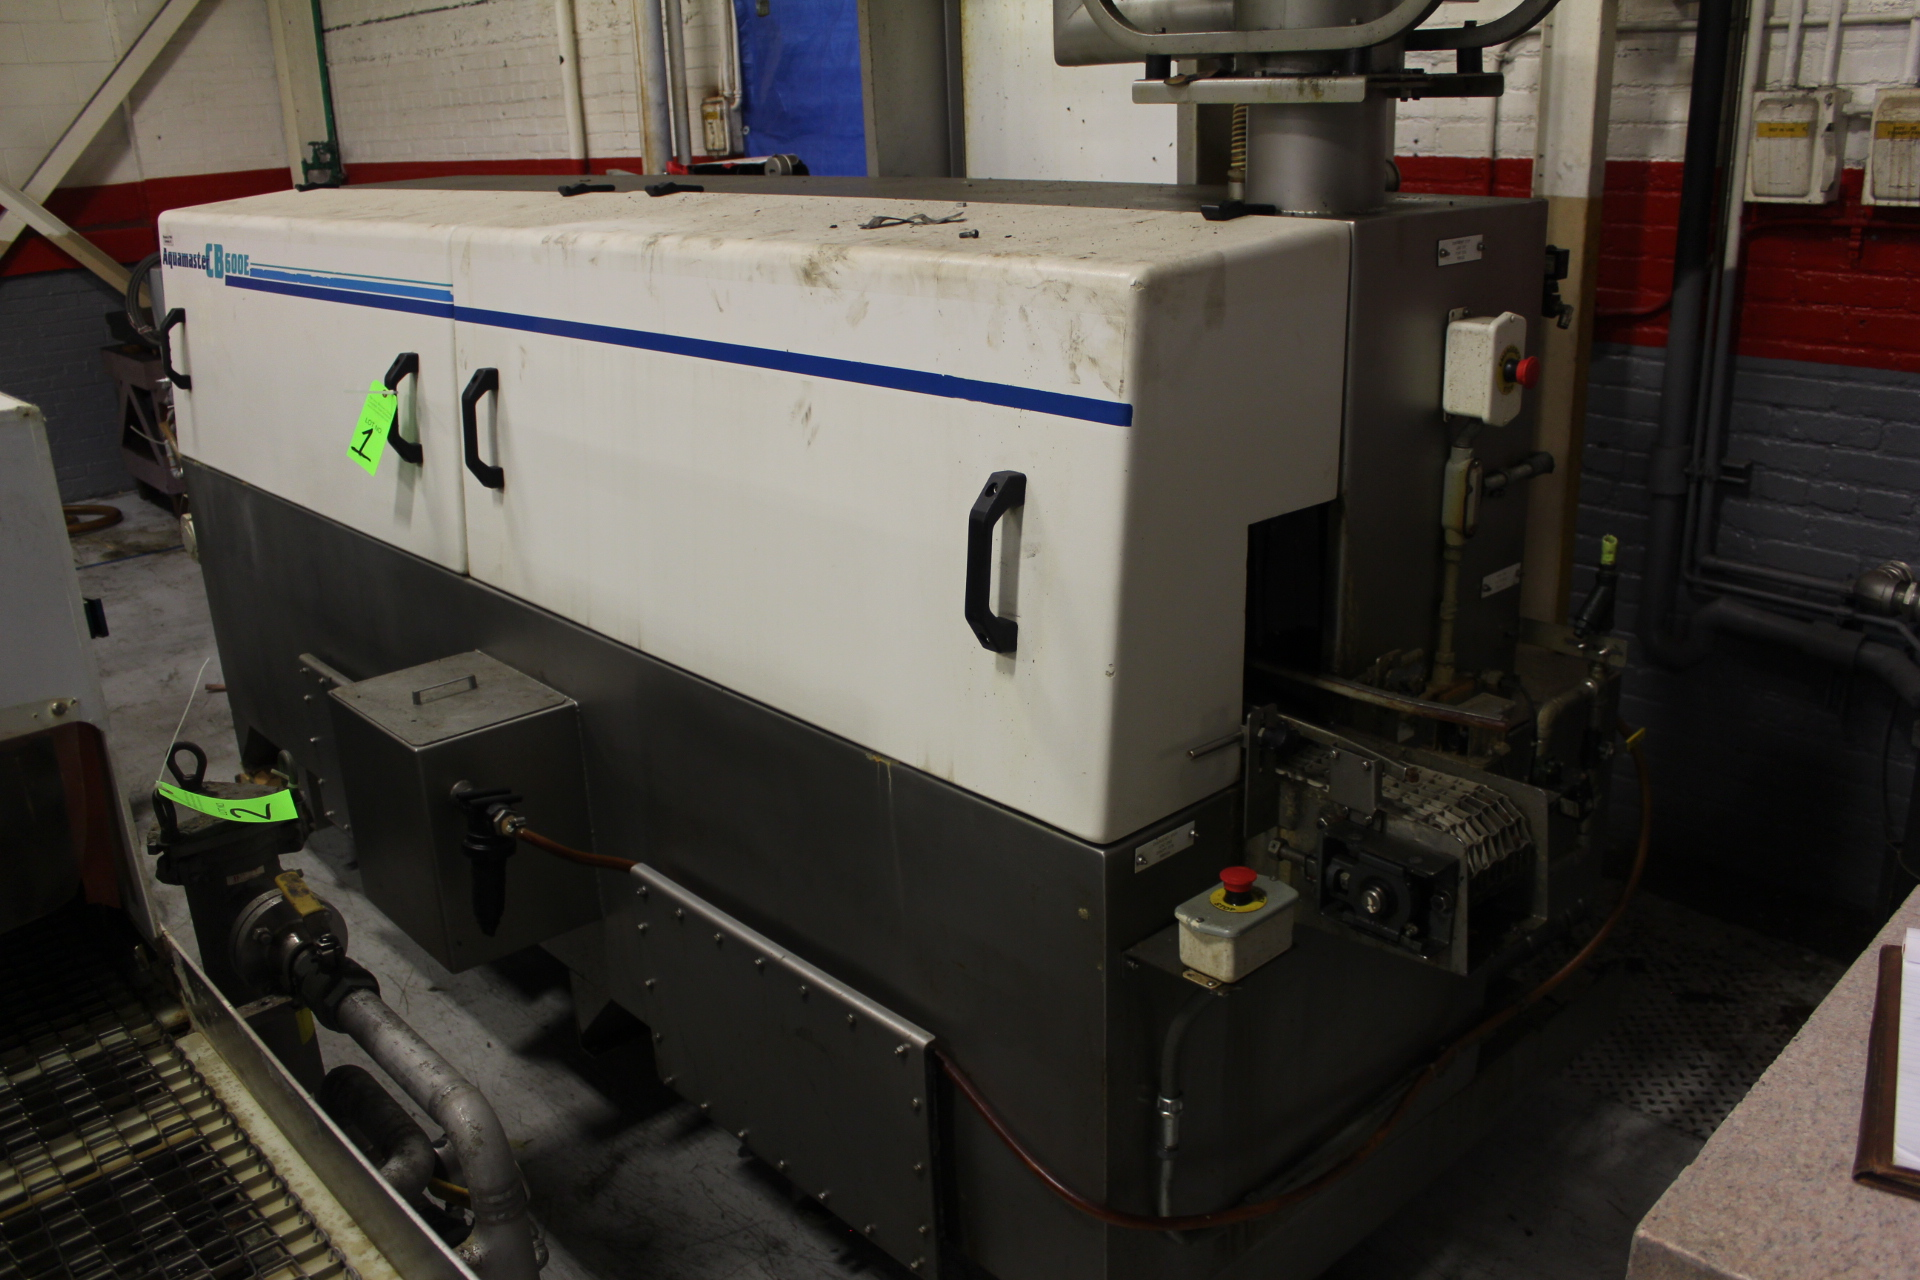 Lot 1 - Aquamaster, Model CB-600E, Parts Washer